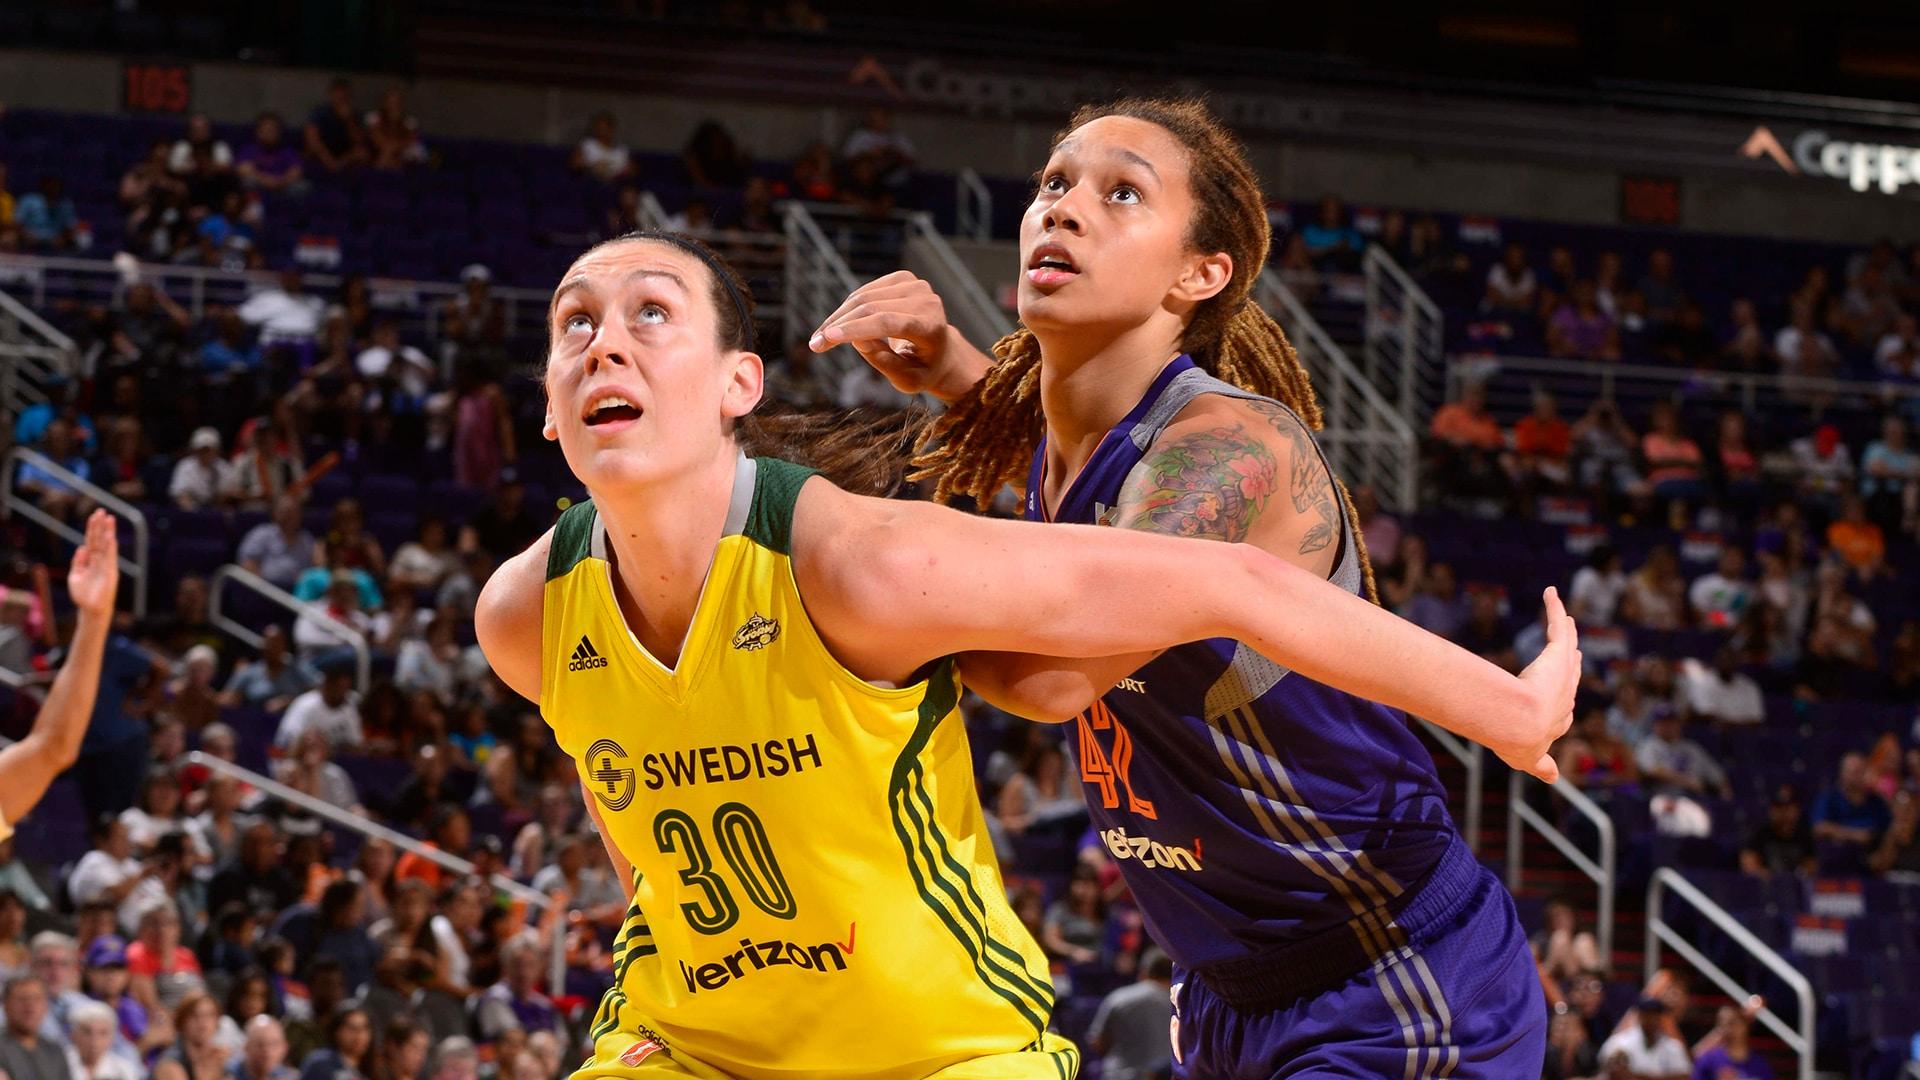 Star power abounds as WNBA playoffs heads to 2nd round